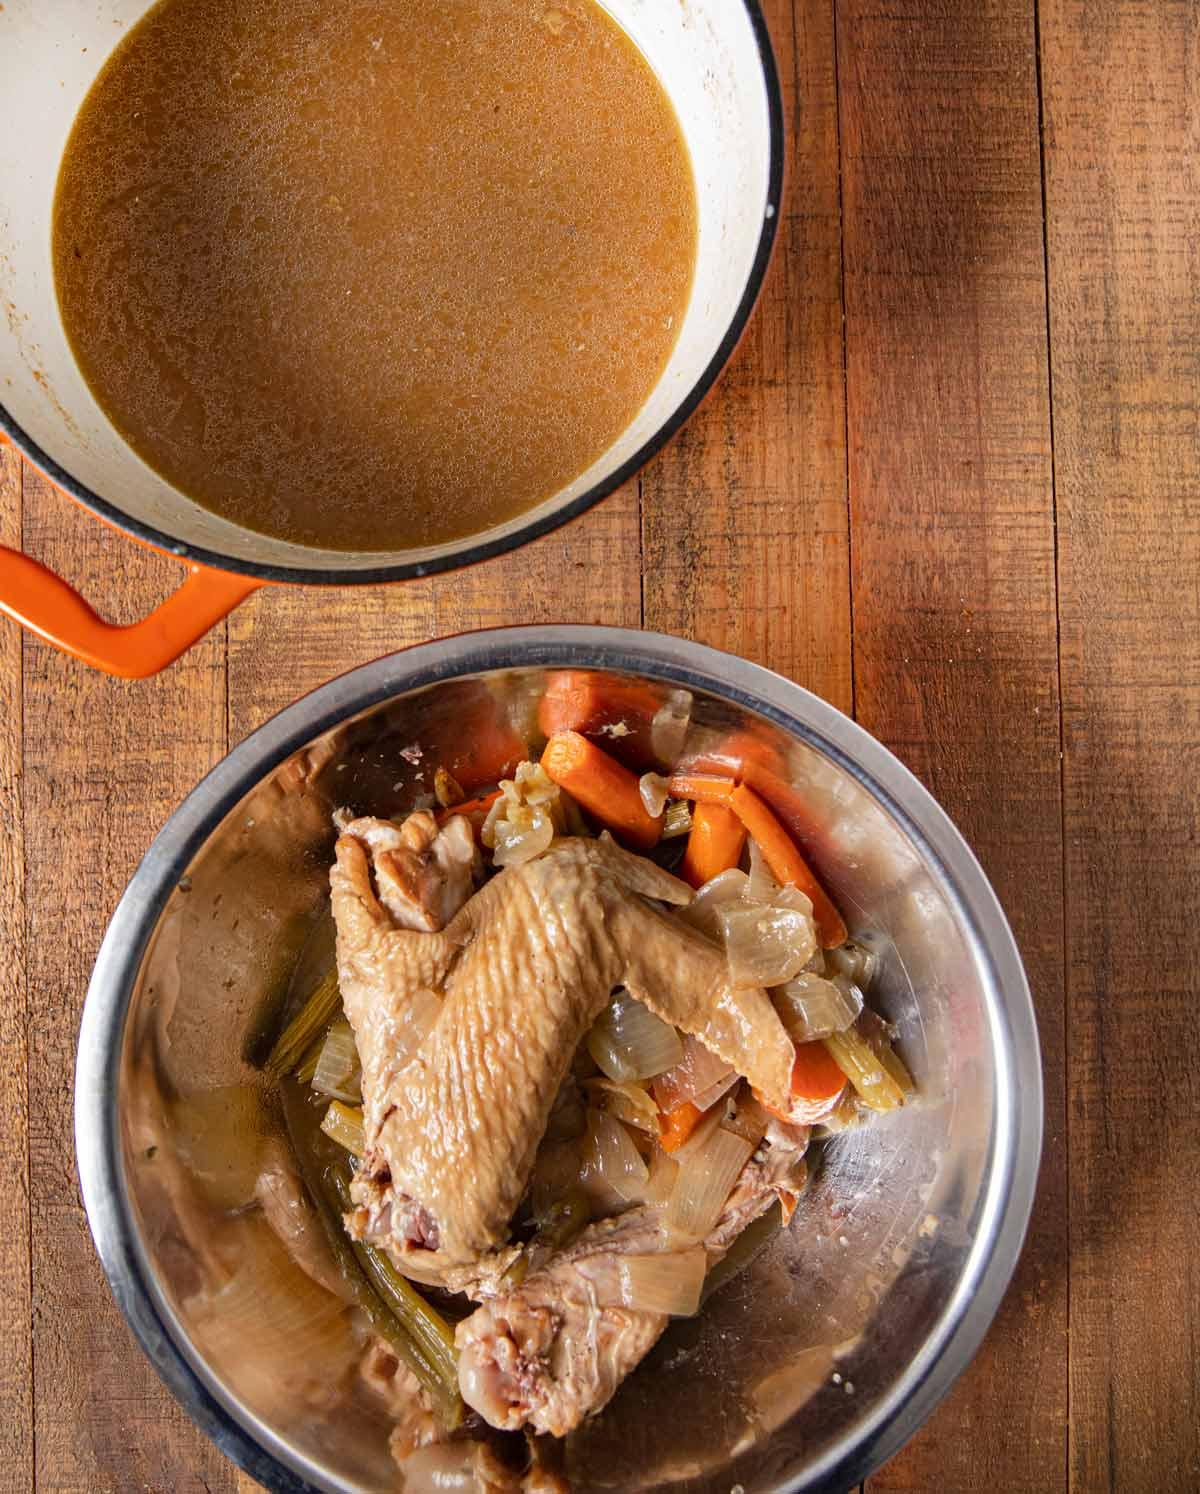 Make-Ahead Turkey Gravy with turkey and vegetables